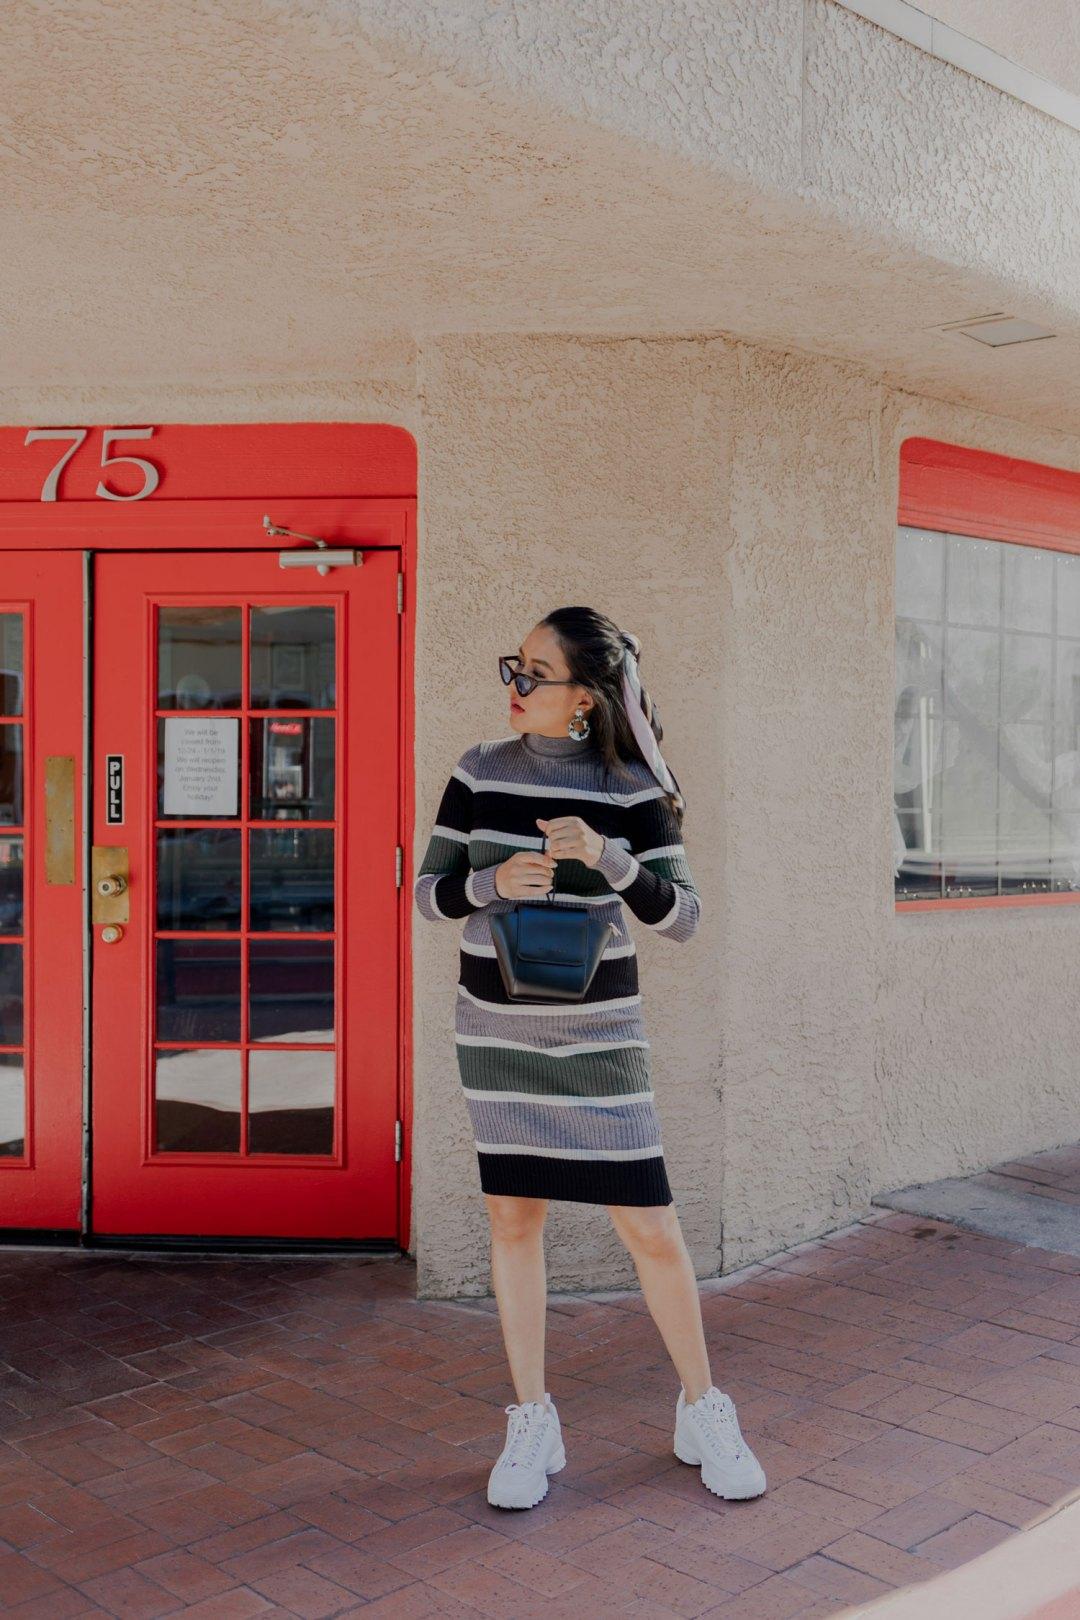 Melie Bianco ADELE Crossbody | Vegan Handbag | The V Armoire_Molly Larsen Style Blogger allaboutgoodvibes.com IG @thevibescloset